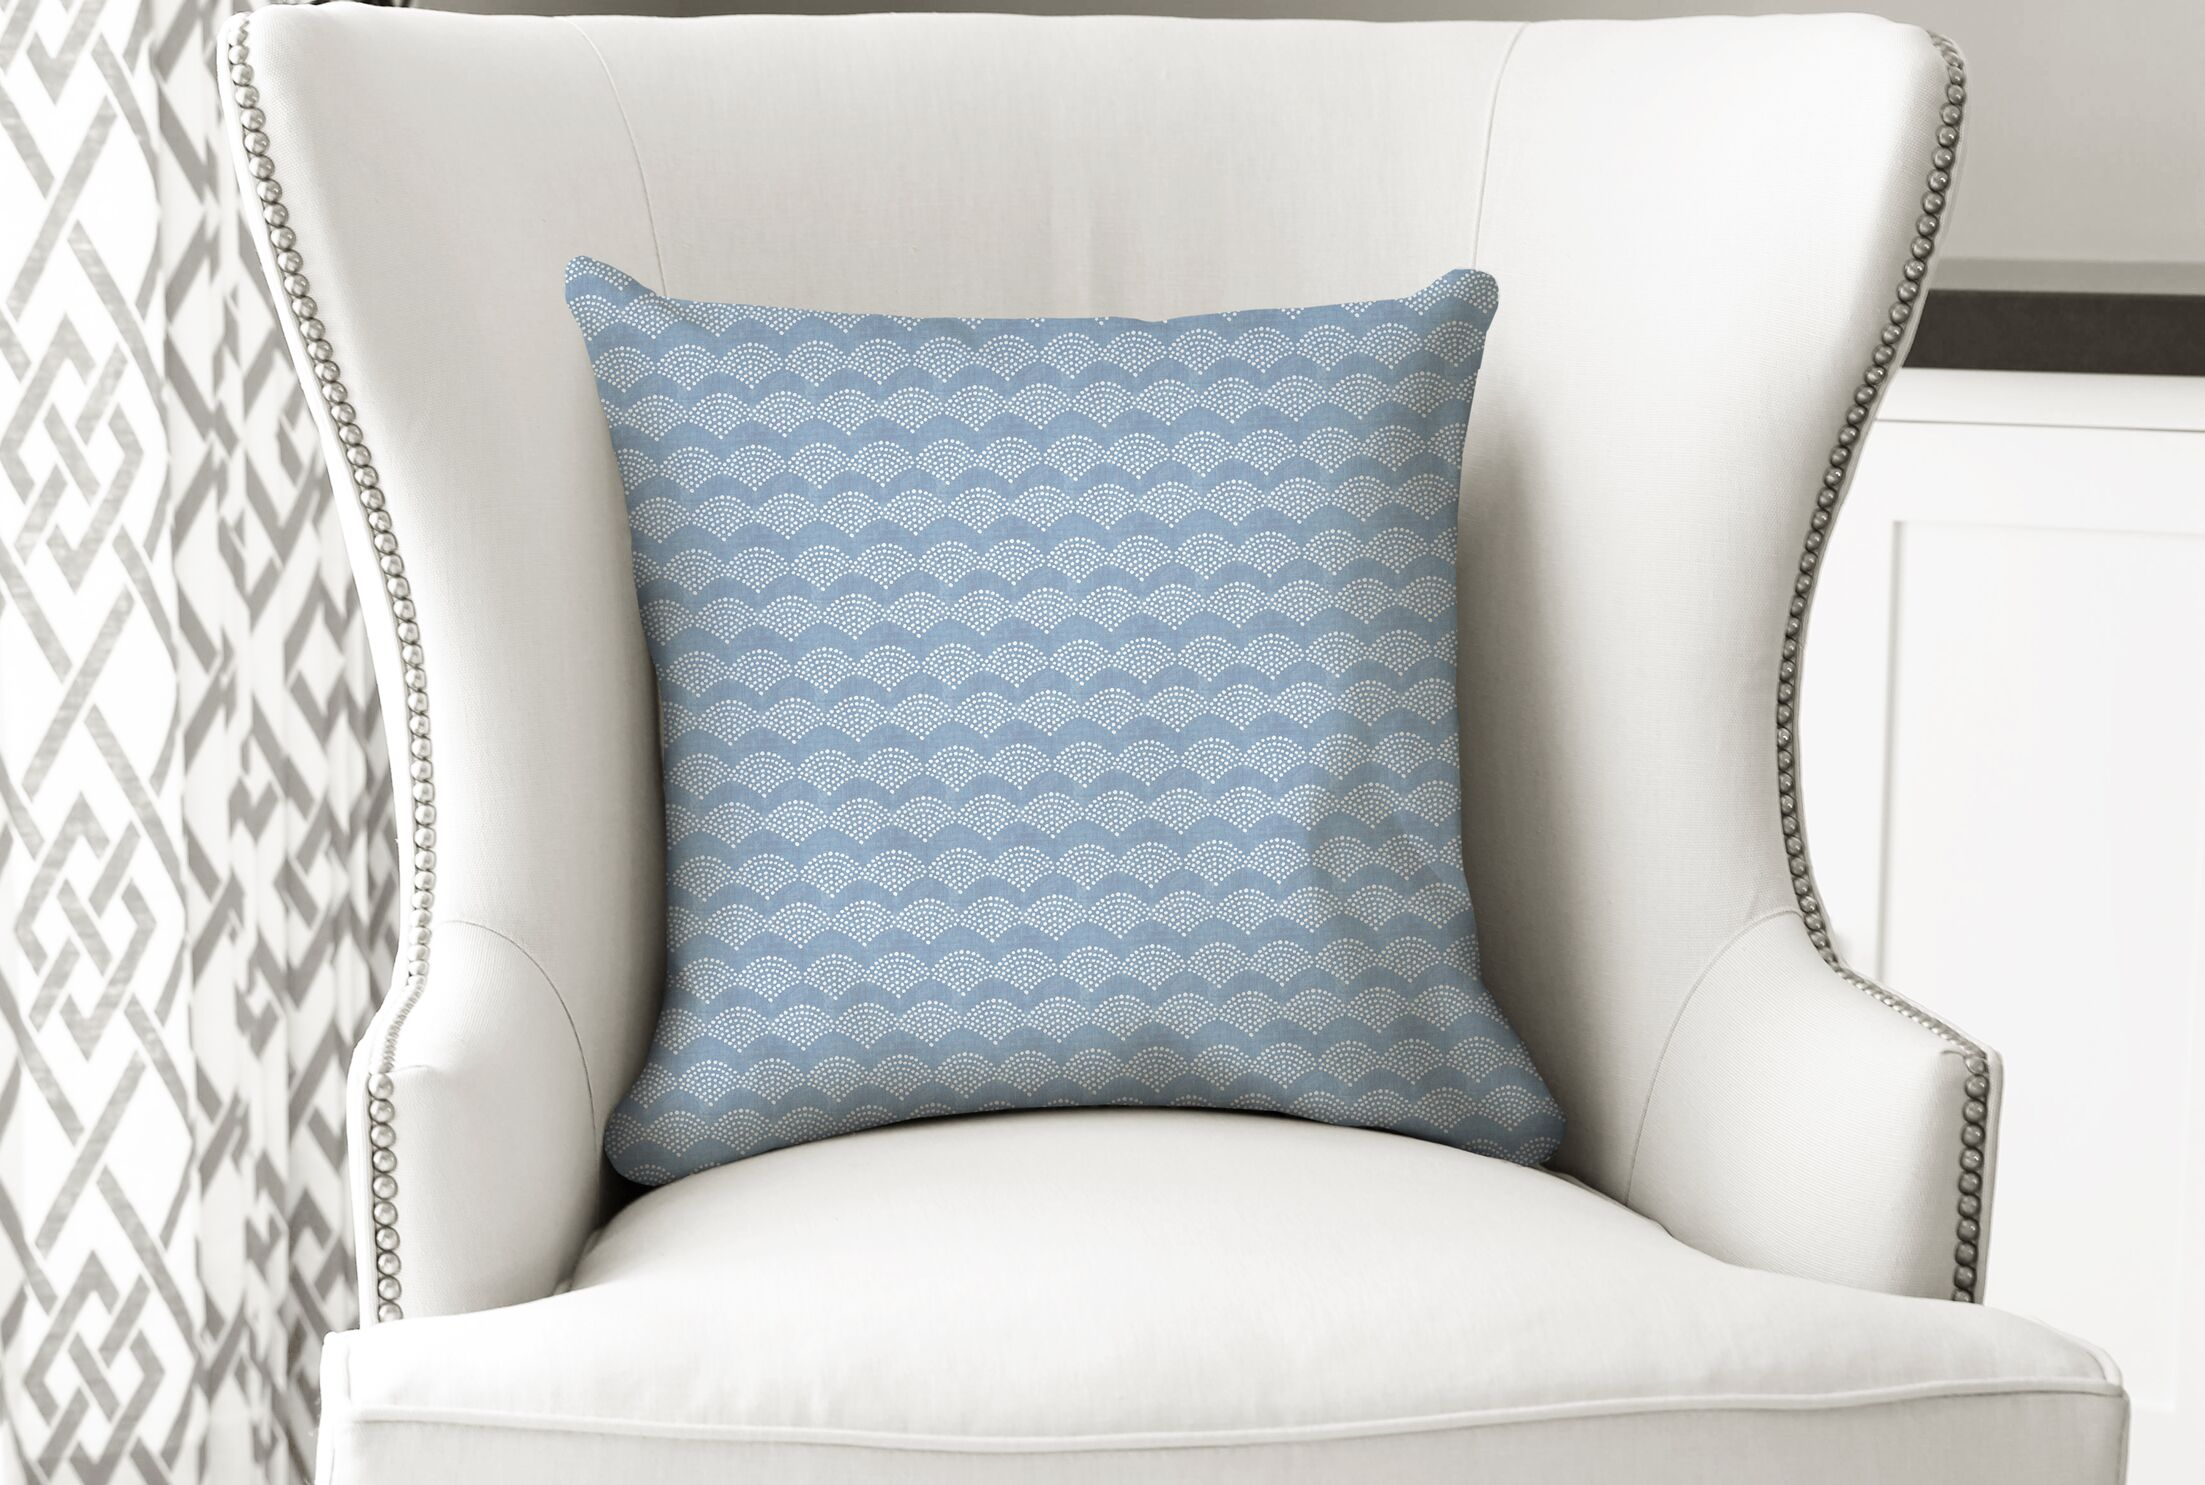 Abrams Arches Accent Pillow Size: 24